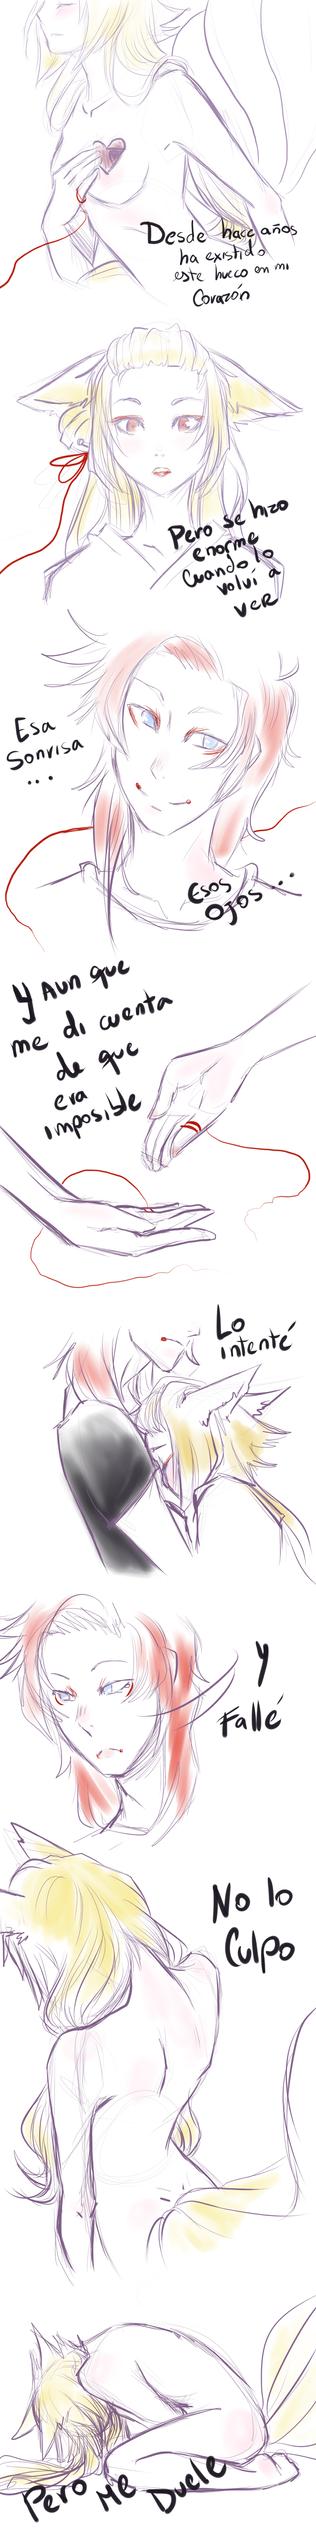 Because it Hurts -GijinkaROL by Lunatica-Ink